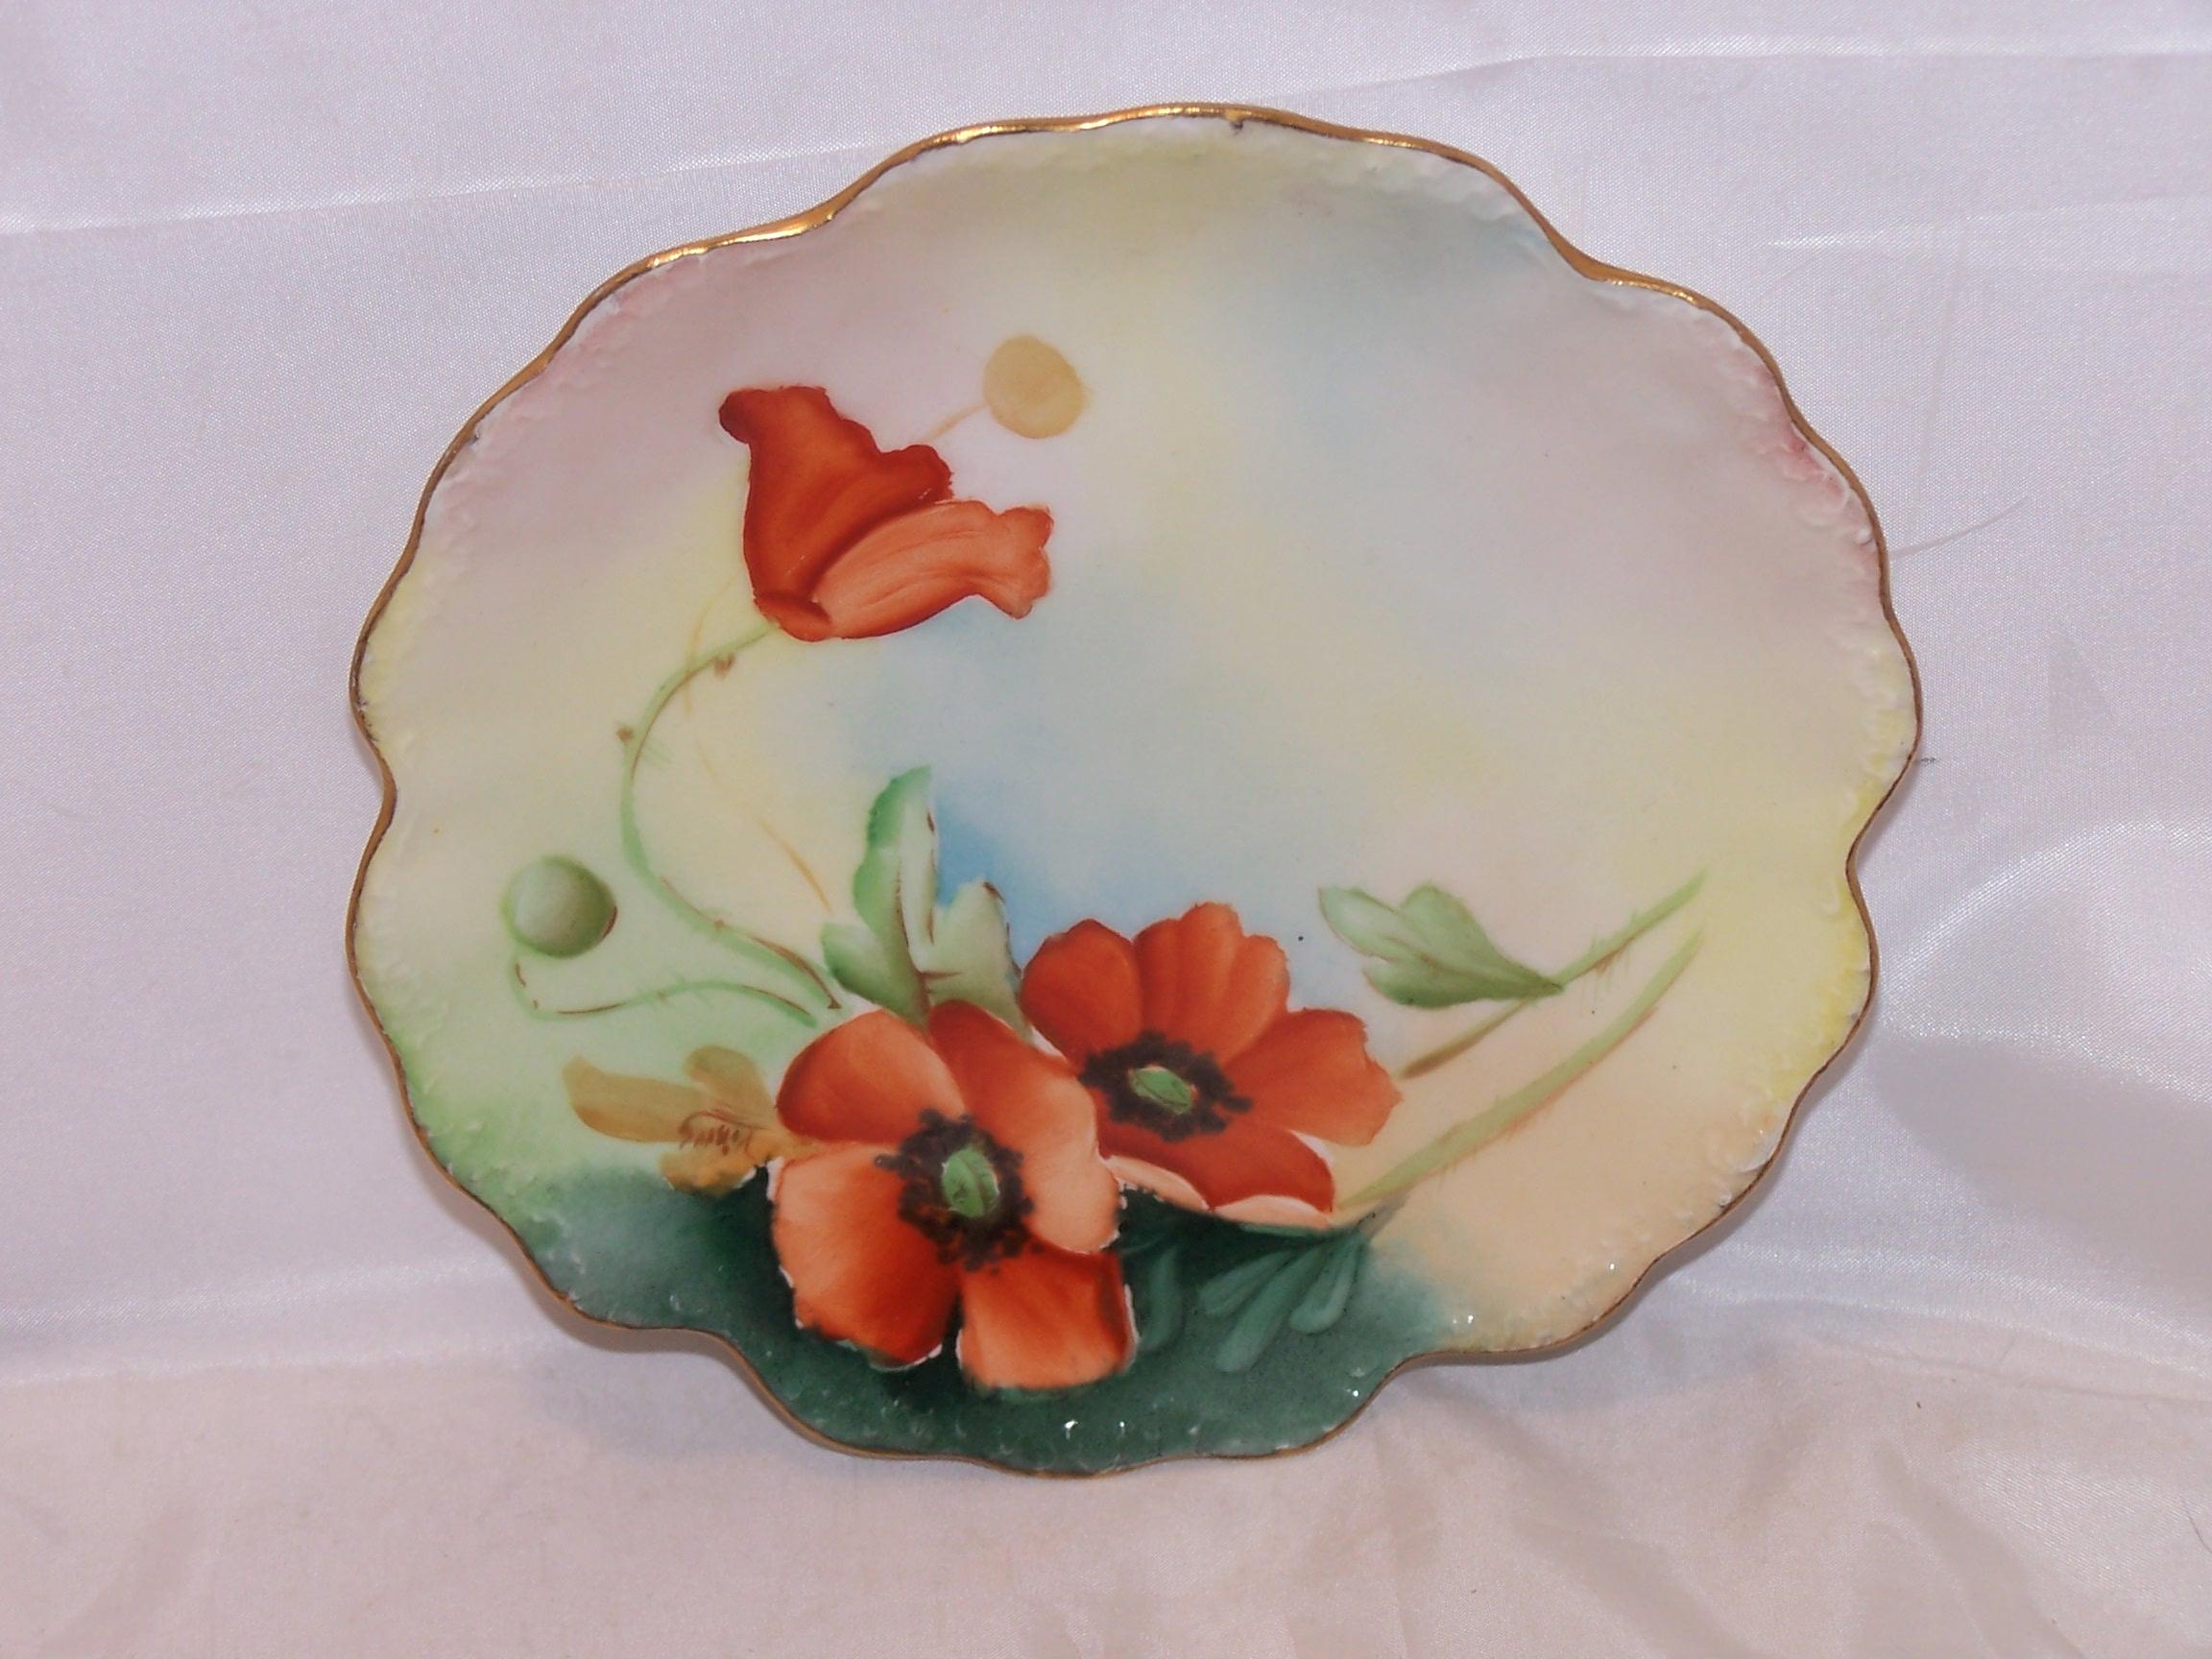 Elite France Poppy Plate, Limoges Porcelain, c 1896 to 1920